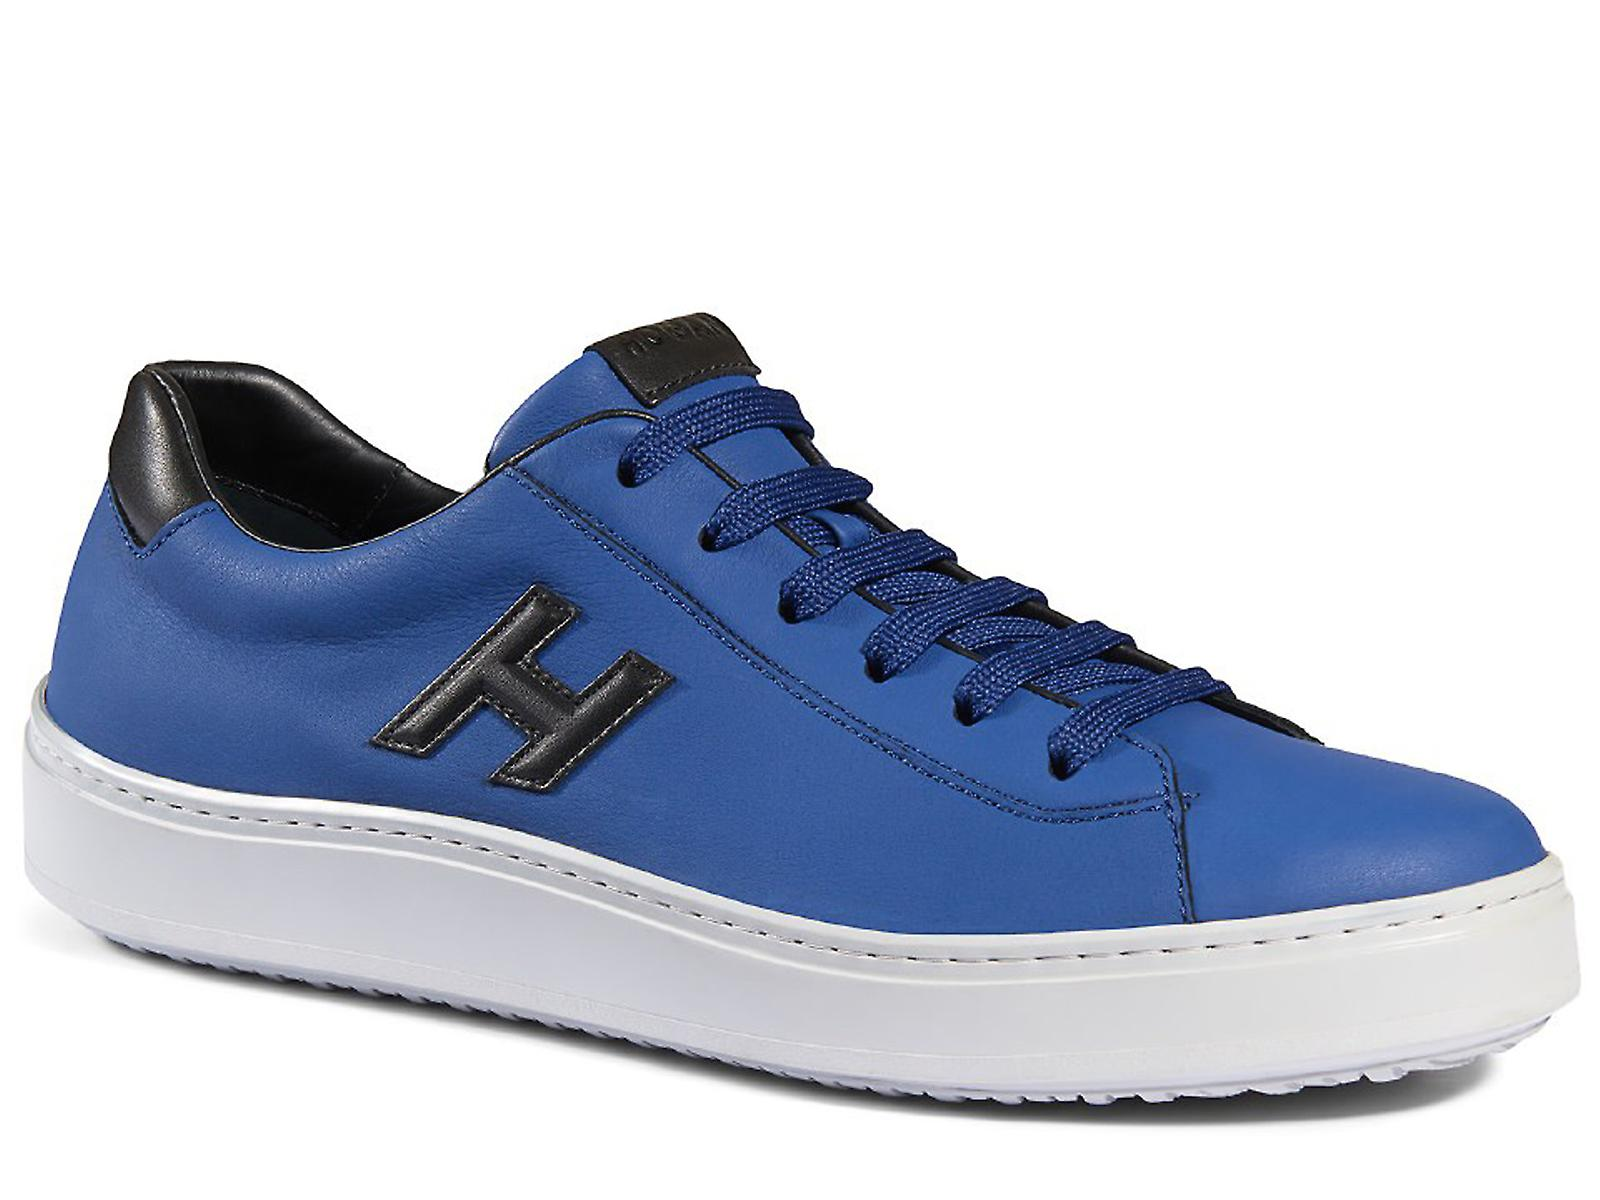 H302 Hogan Herrenschuhe Sneaker in blau Leder  0cbdbffc628